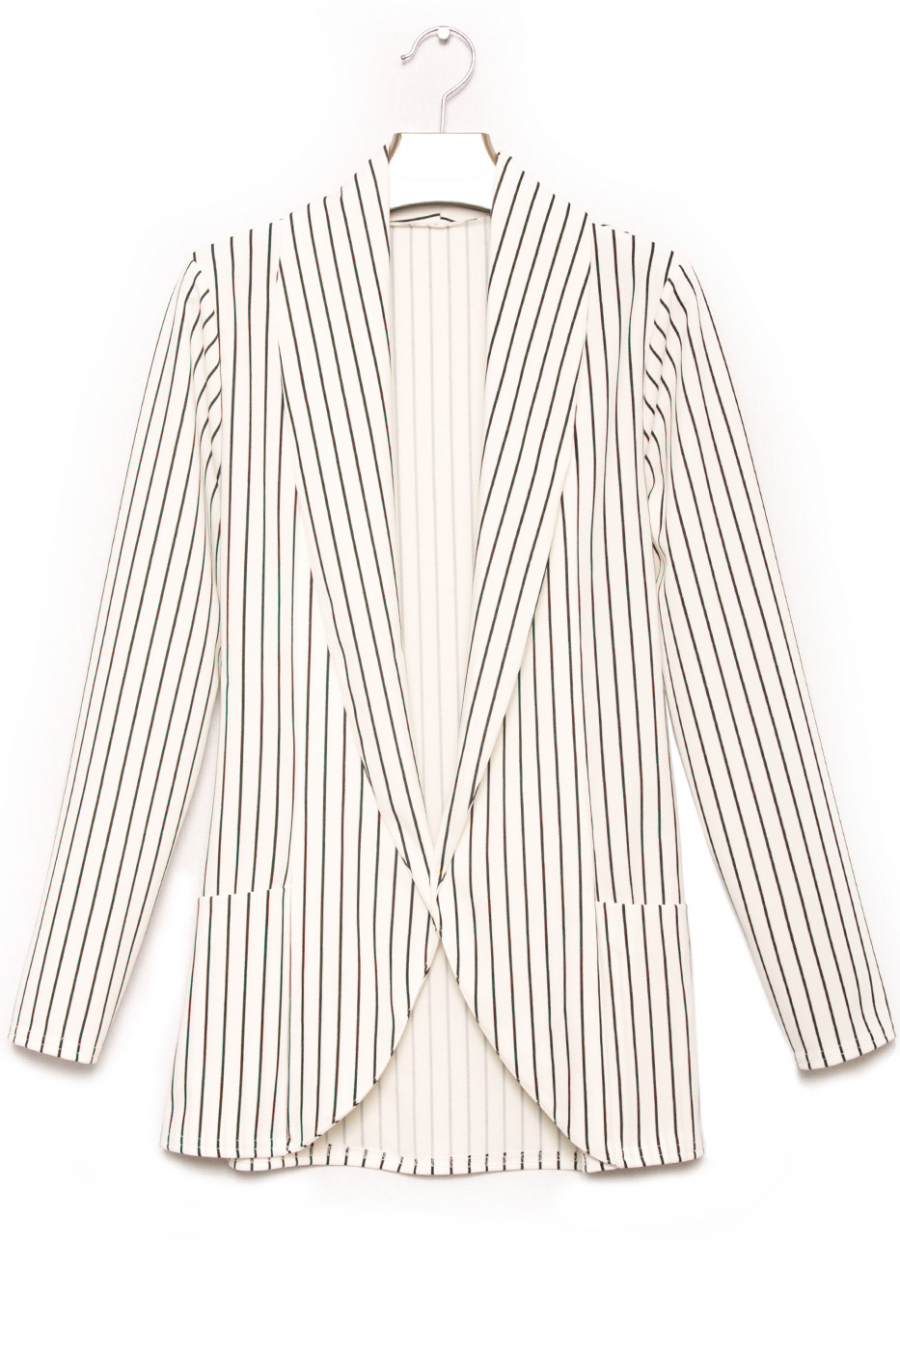 White and black fashion blazer with pocket. Women's fashion jacket 1526